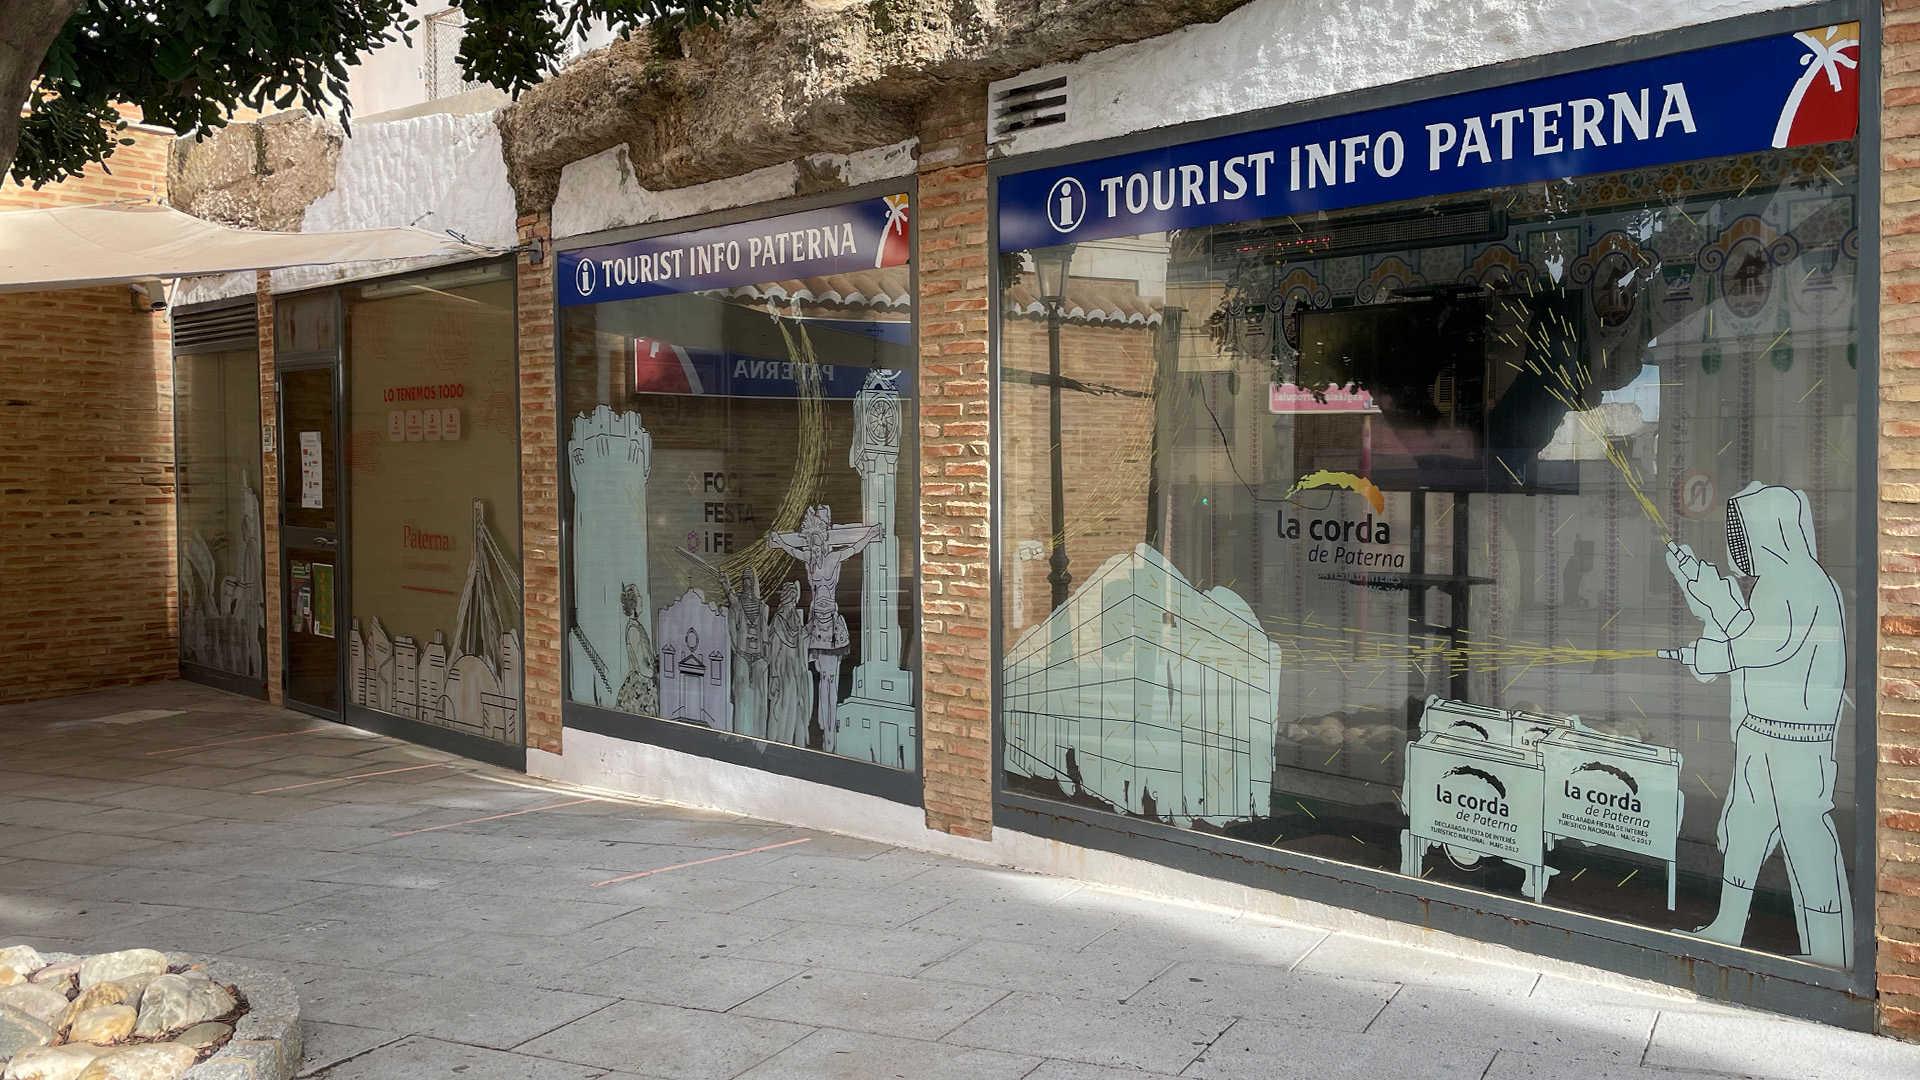 TOURIST INFO PATERNA